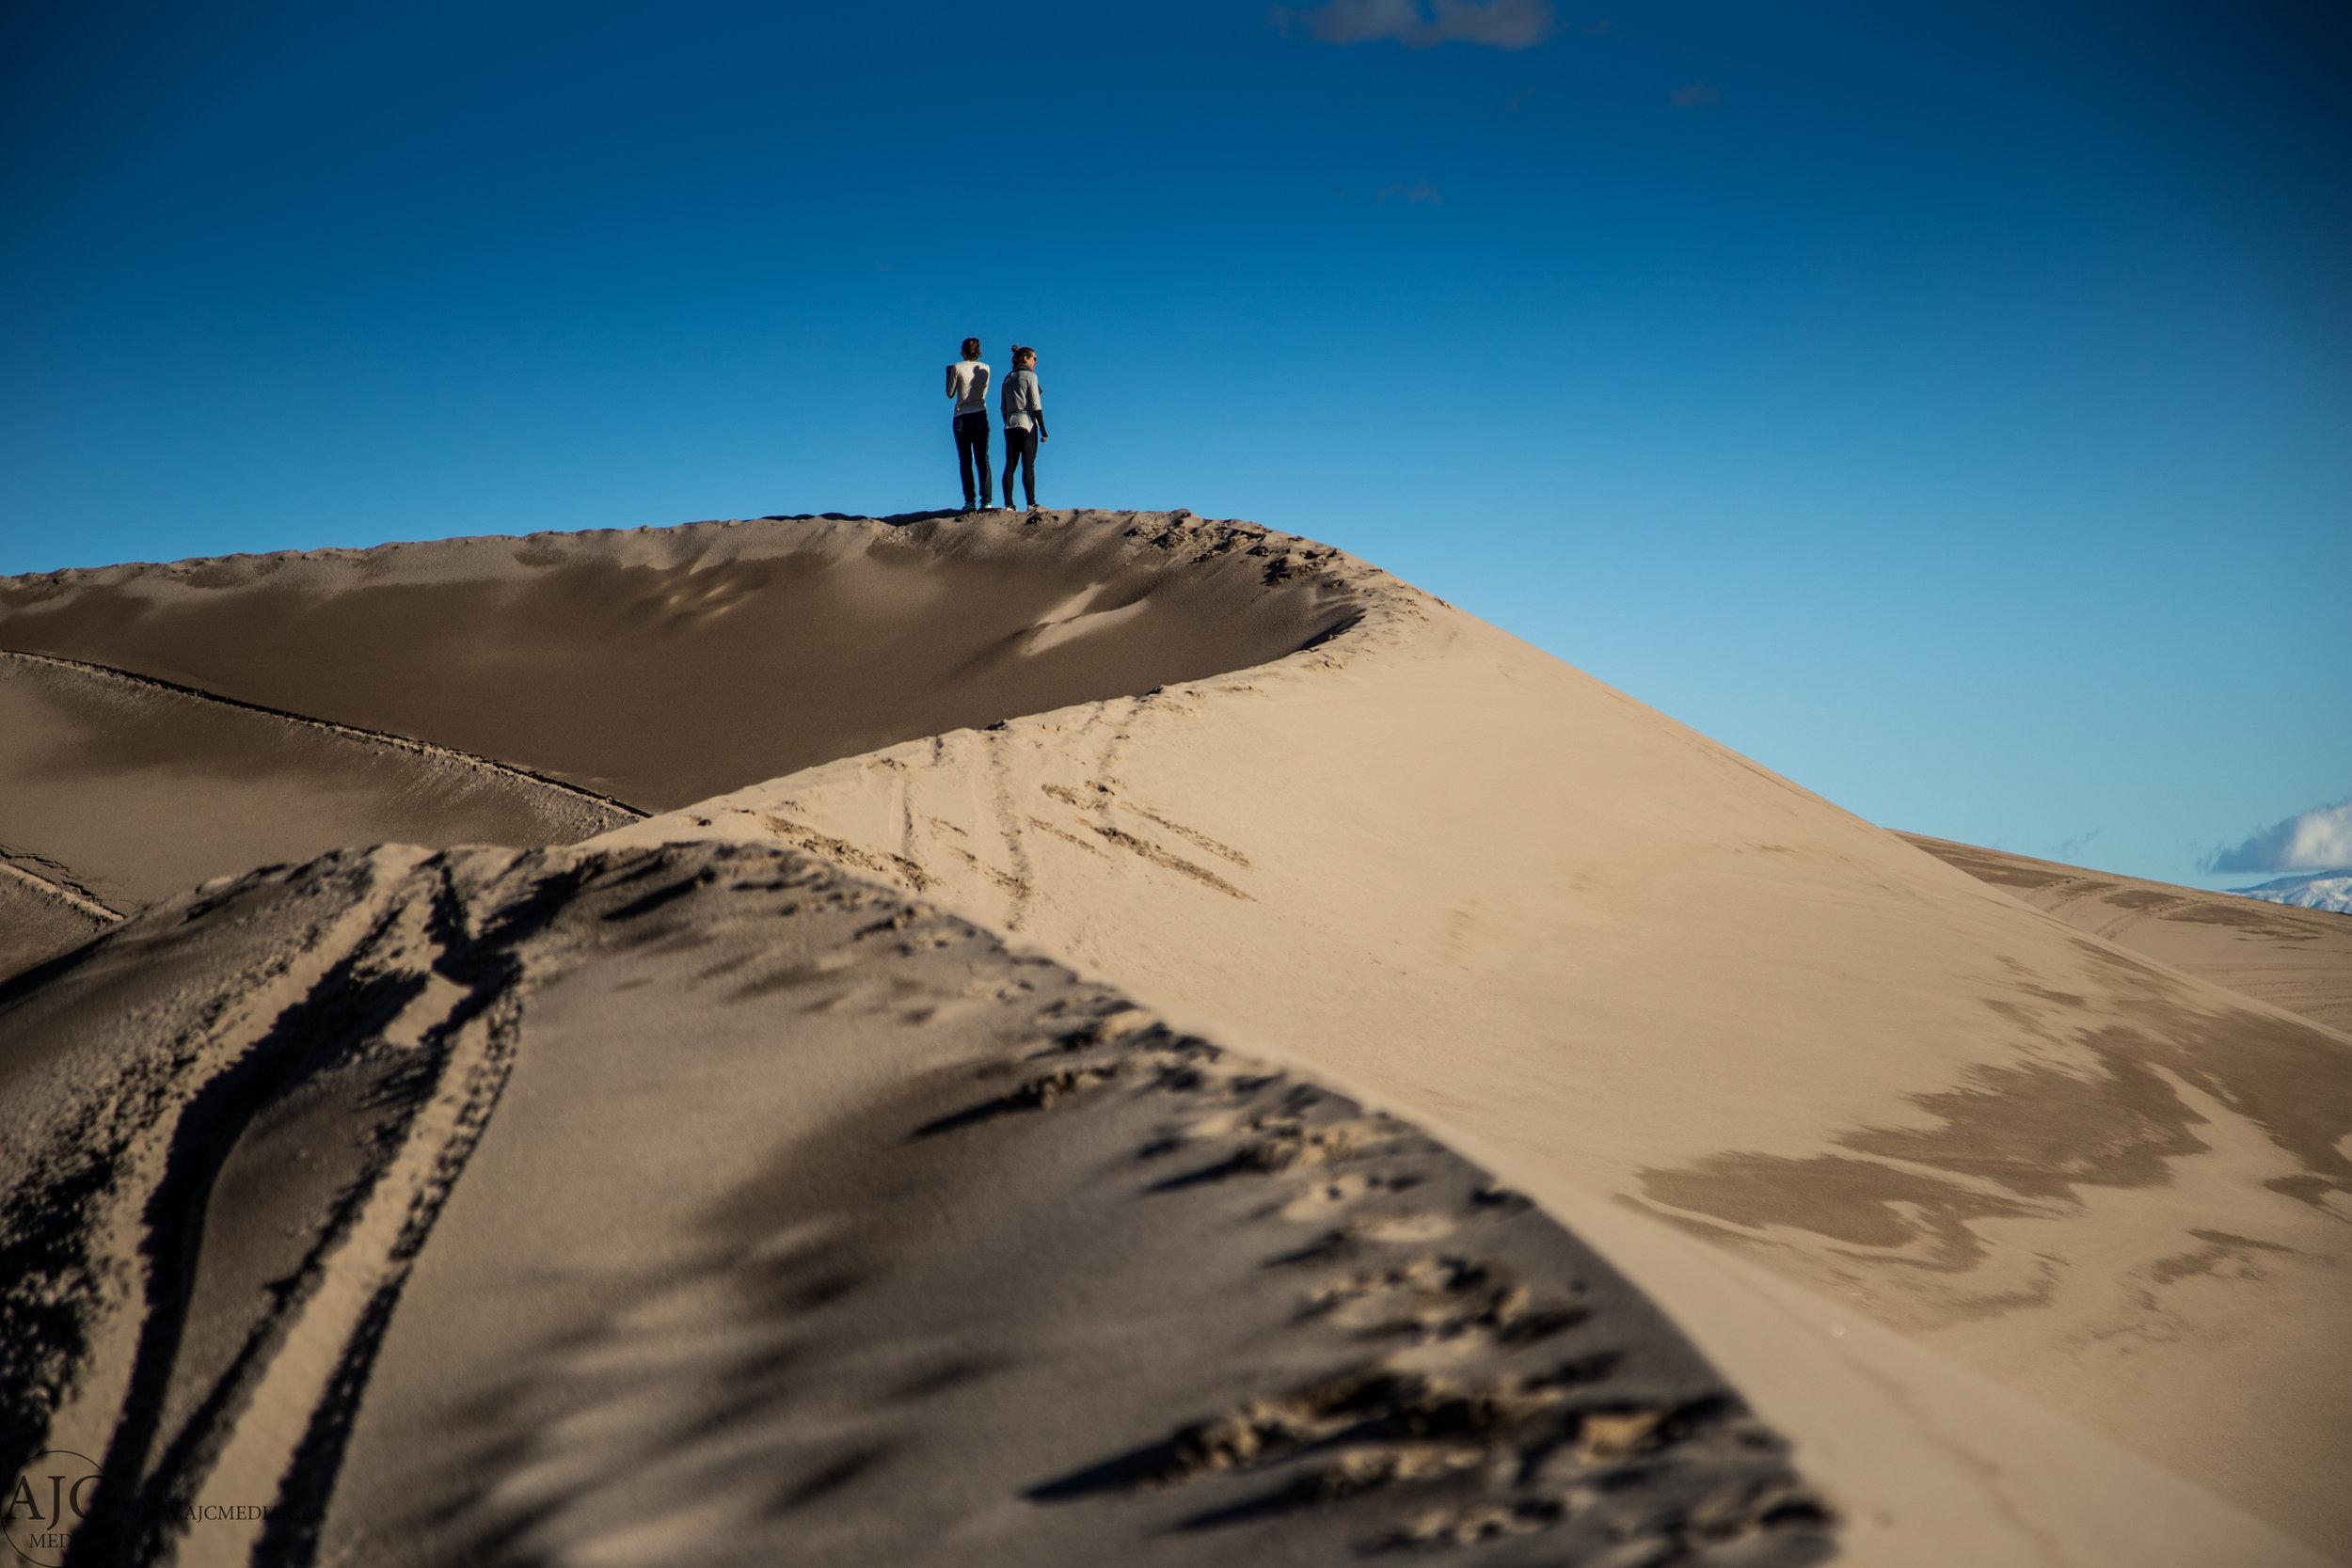 The girls climbing the dunes.